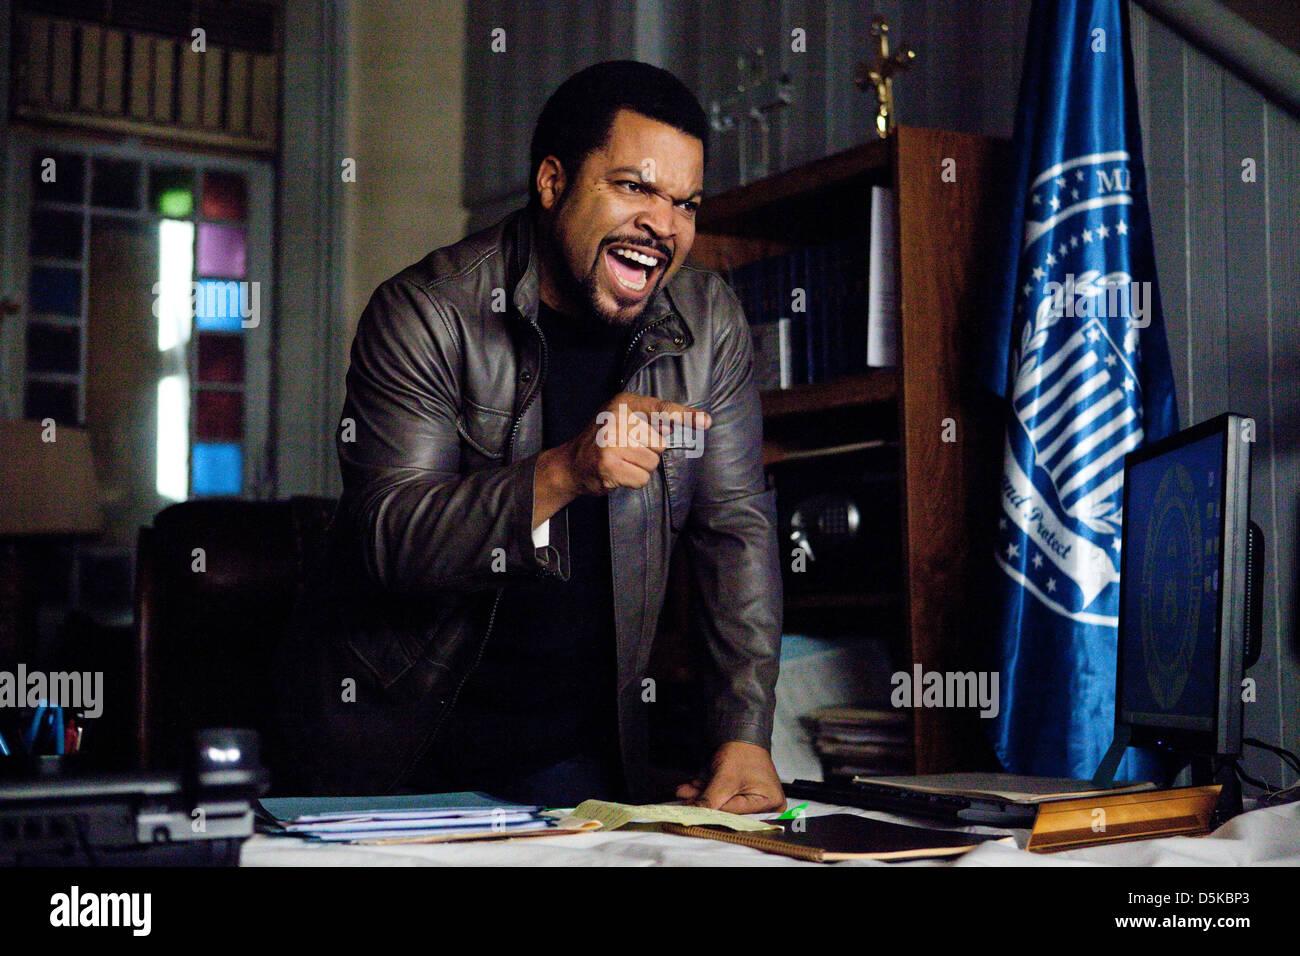 Ice Cube 21 Jump Street 2012 Stock Photo Alamy